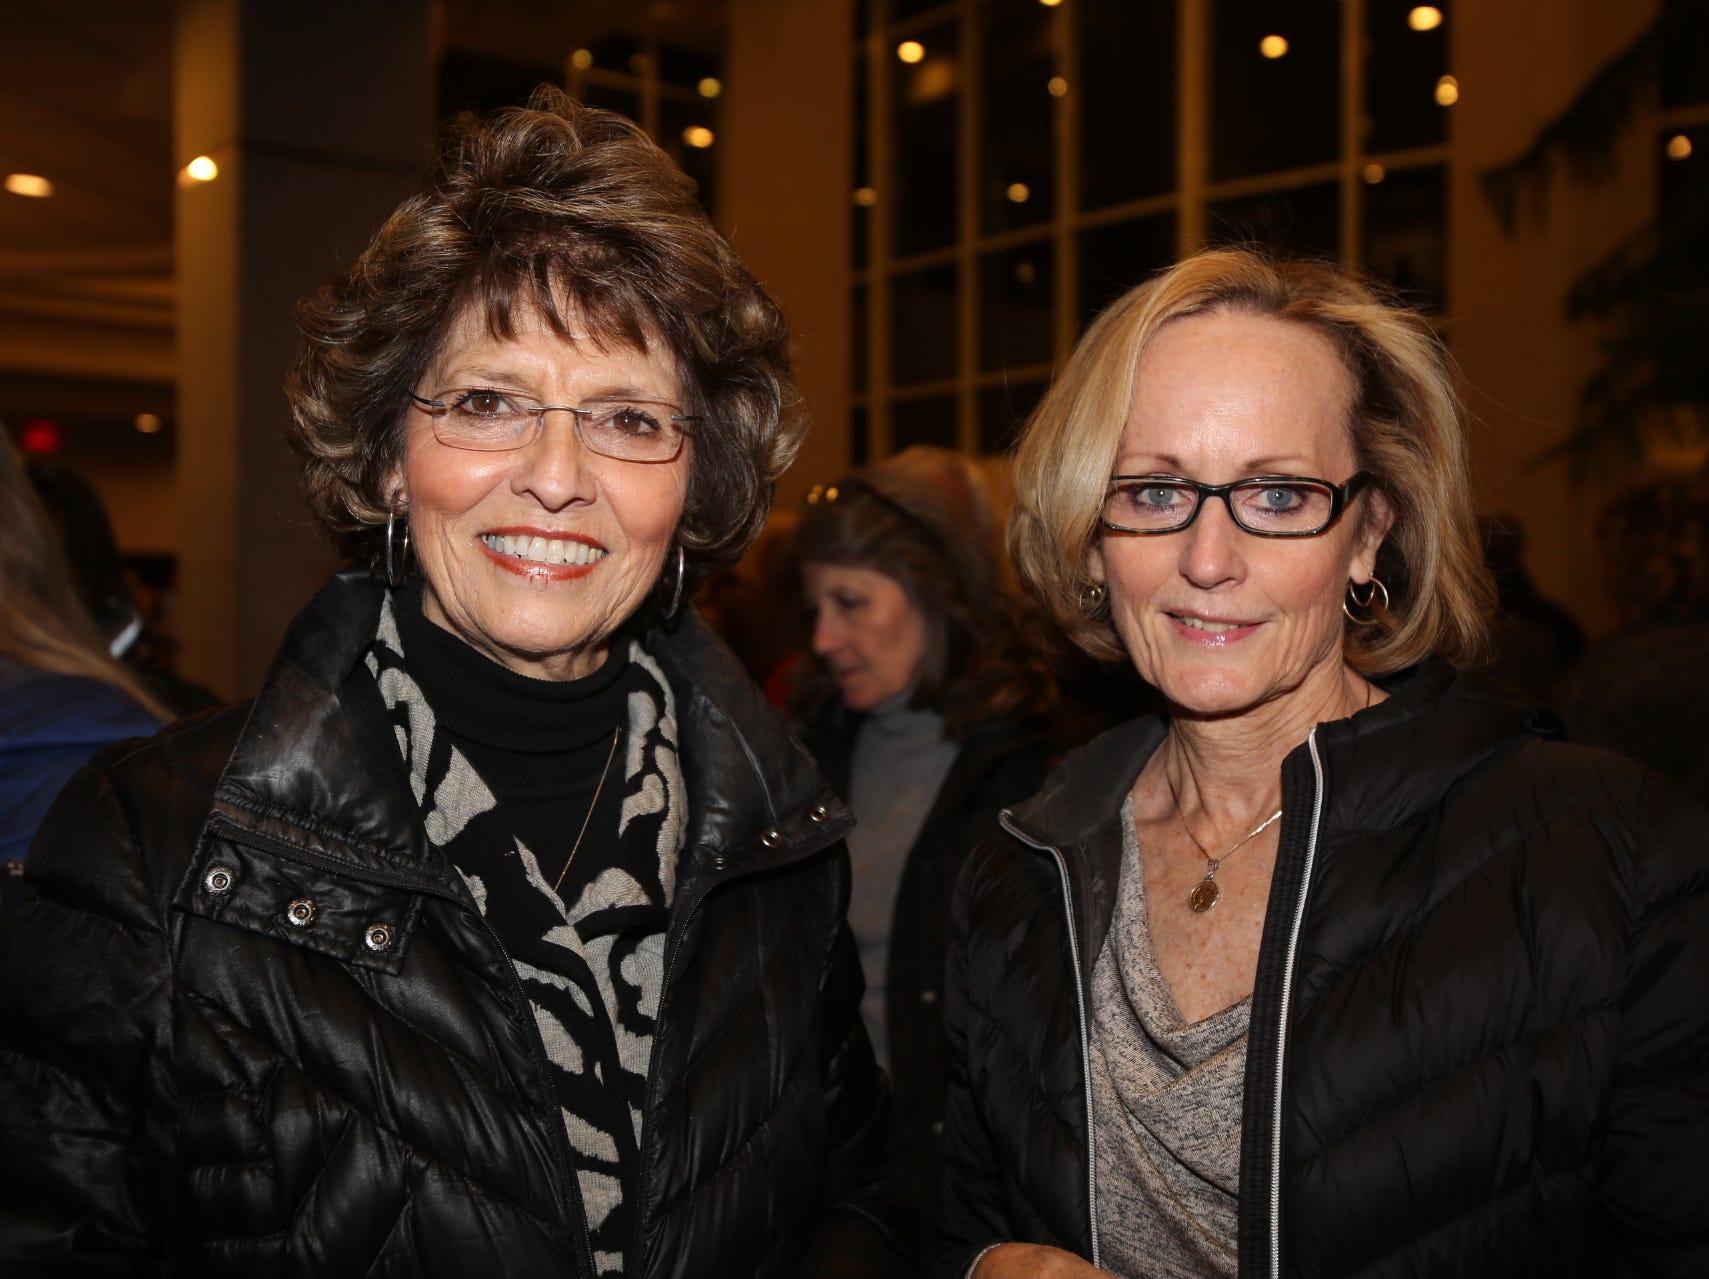 Noma Montgomery and Barb Farrar